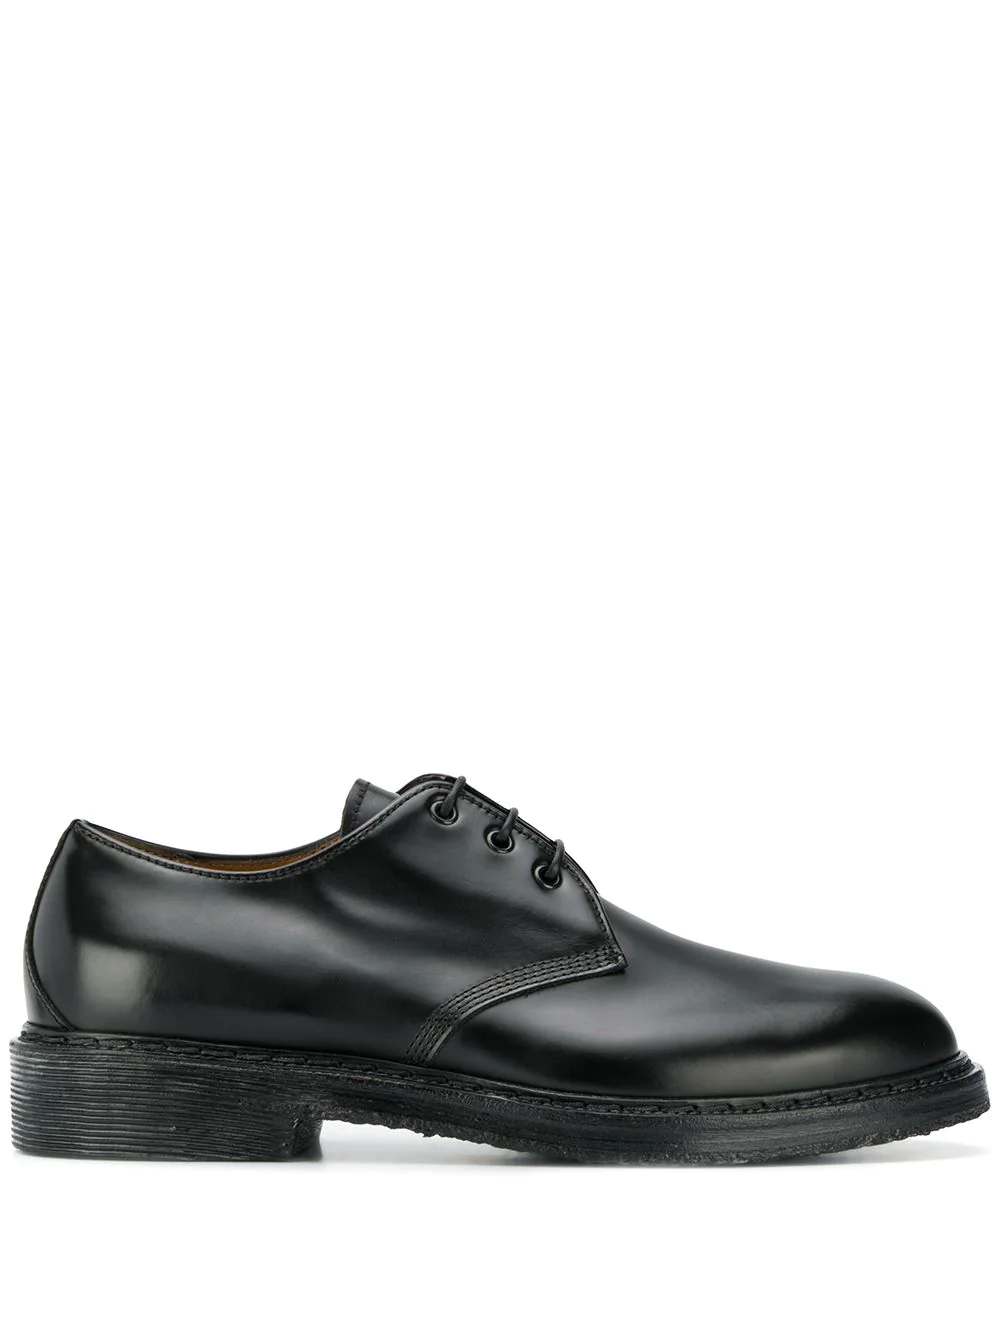 Silvano Sassetti   туфли на шнуровке   Clouty